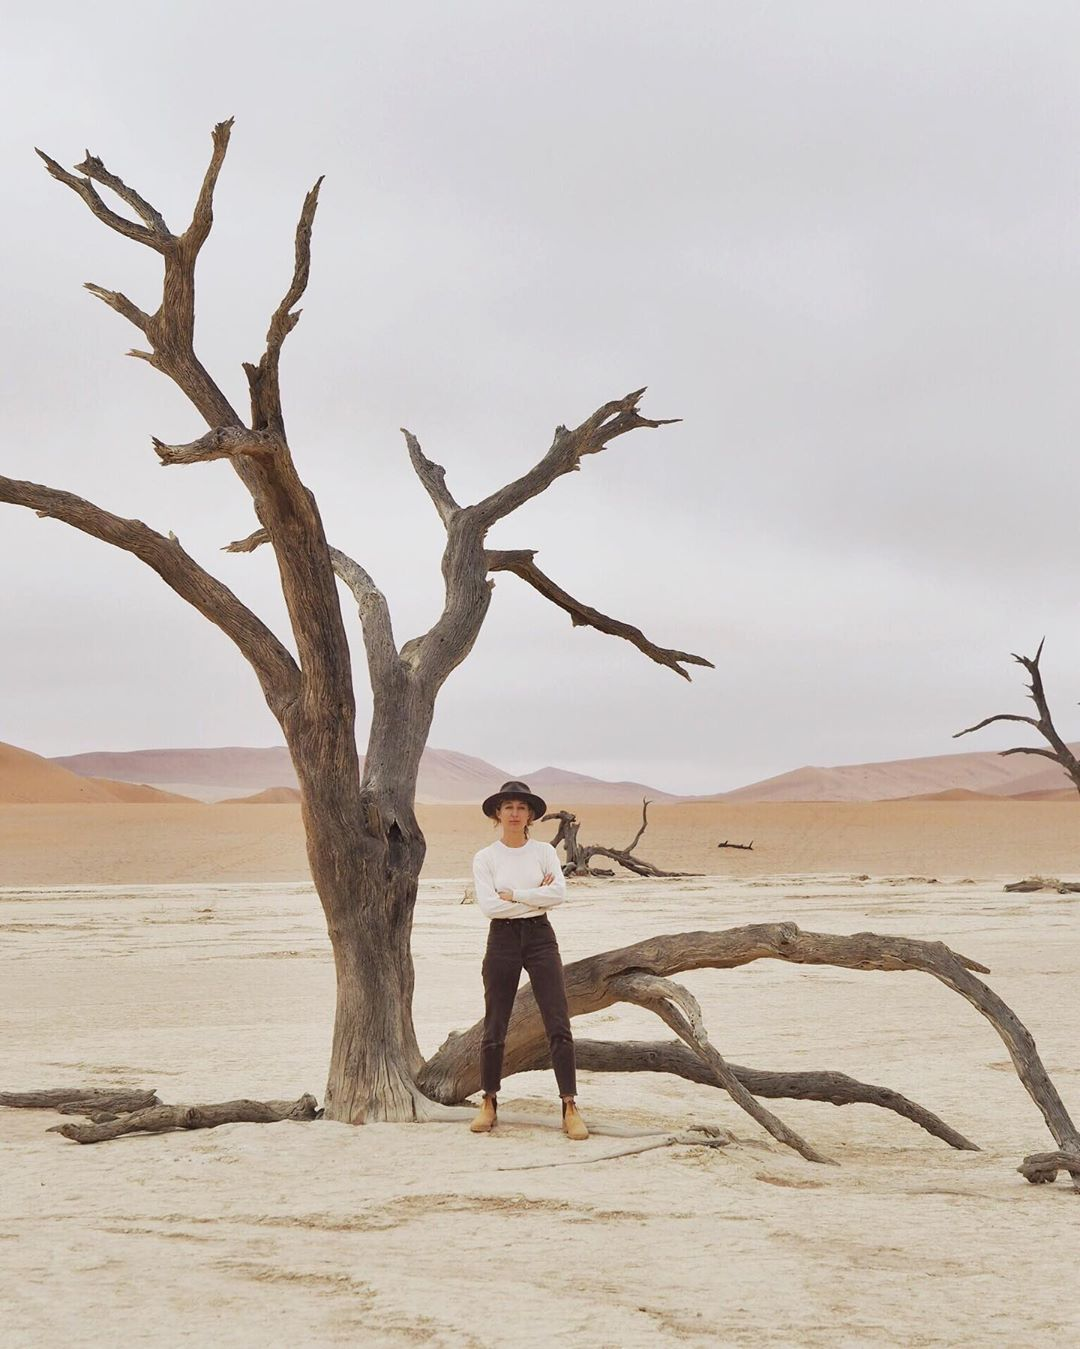 Nina Karnikowski travel writing in Namibia | My Life Unhurried